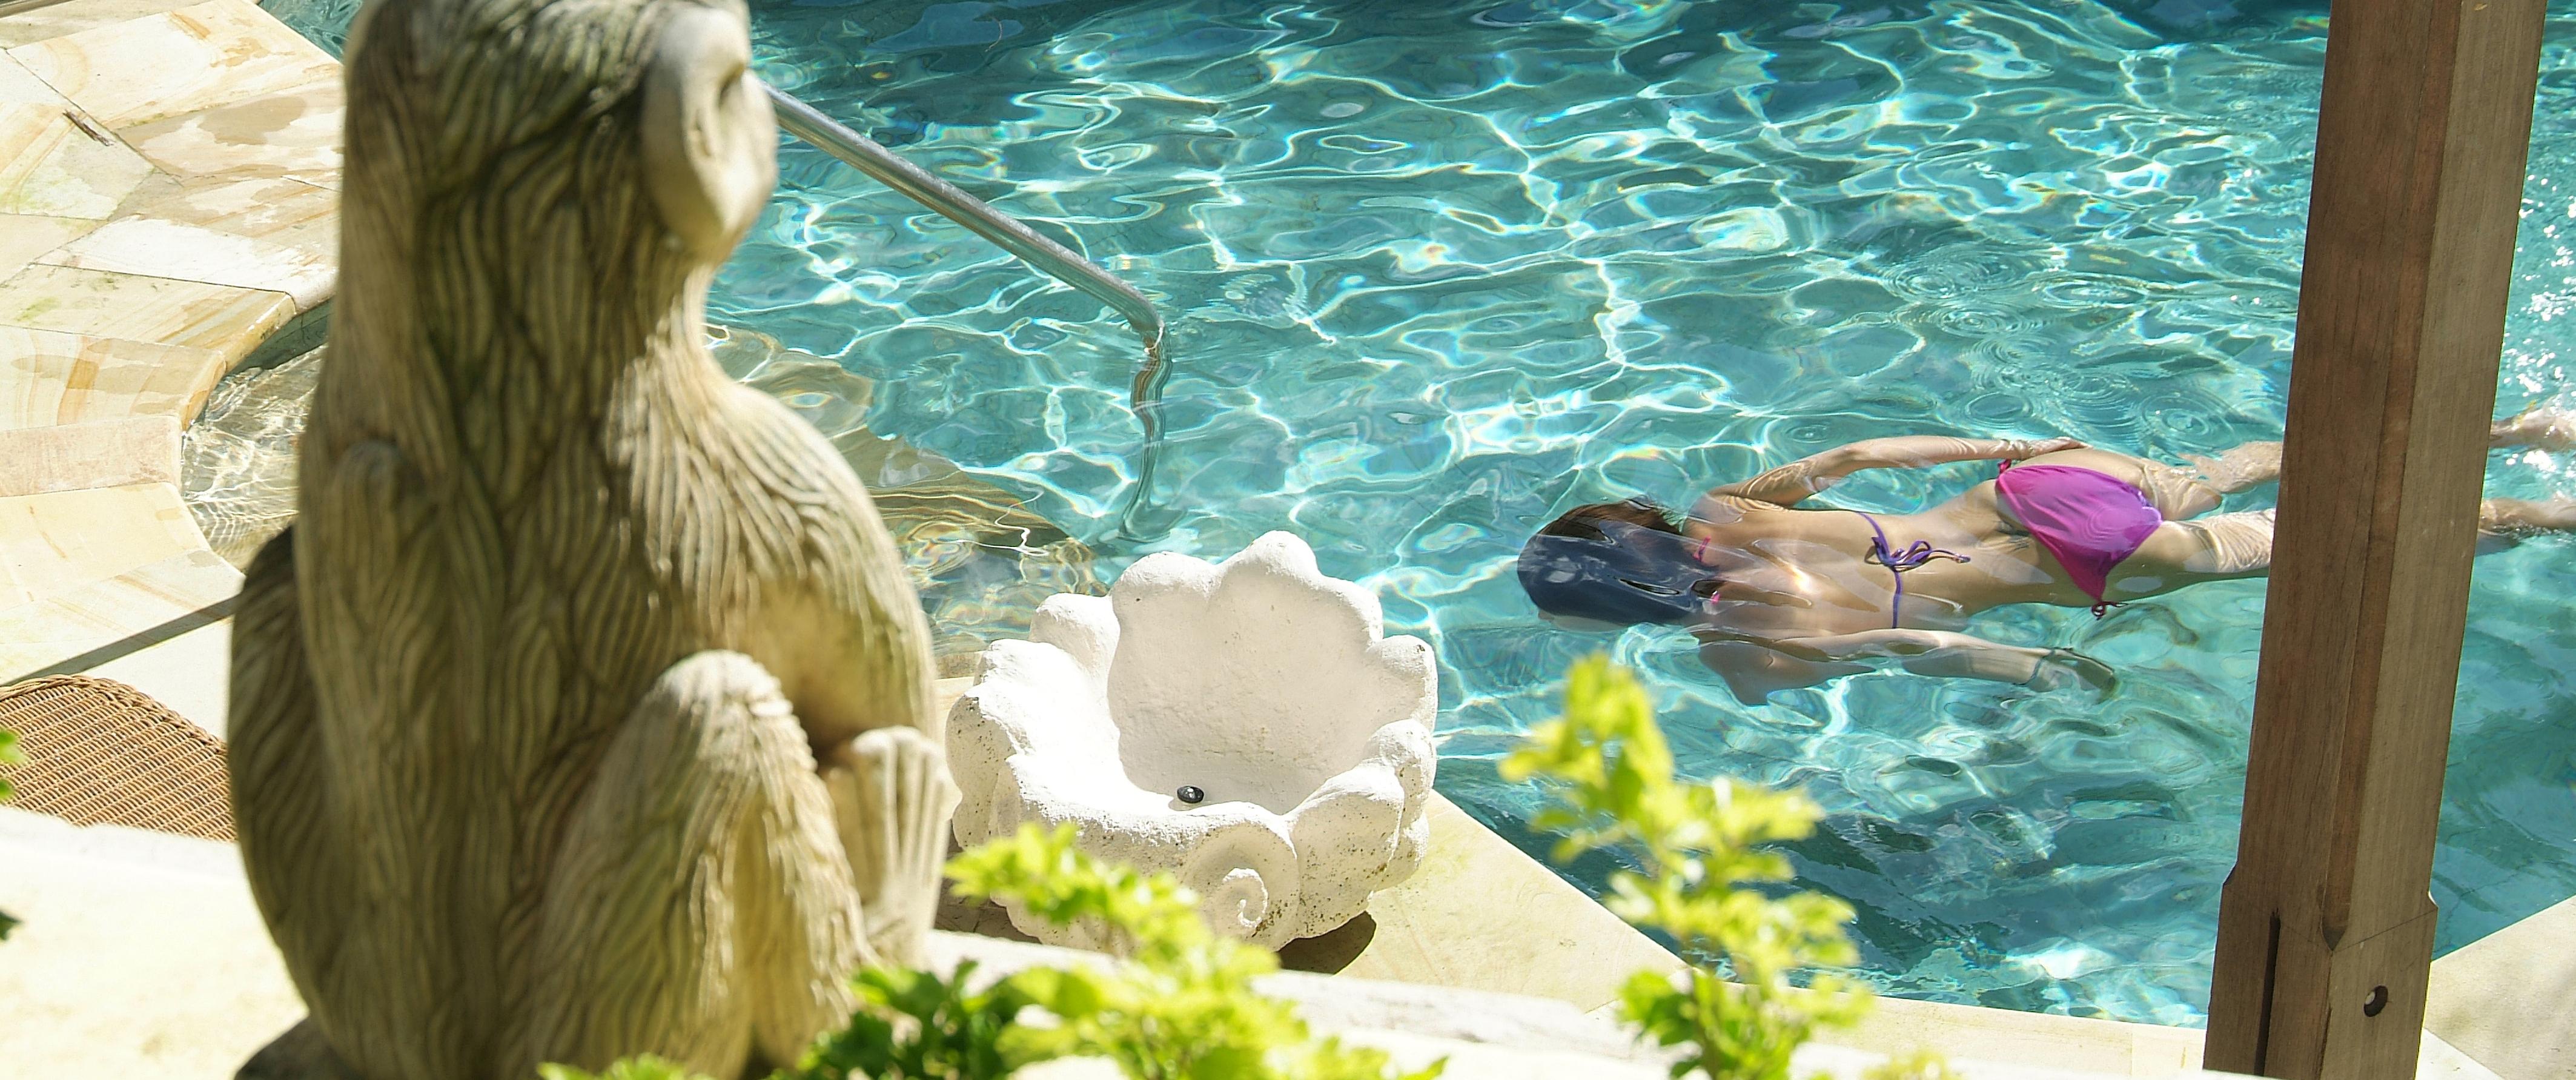 Oasis-Pool-little-good-harbour